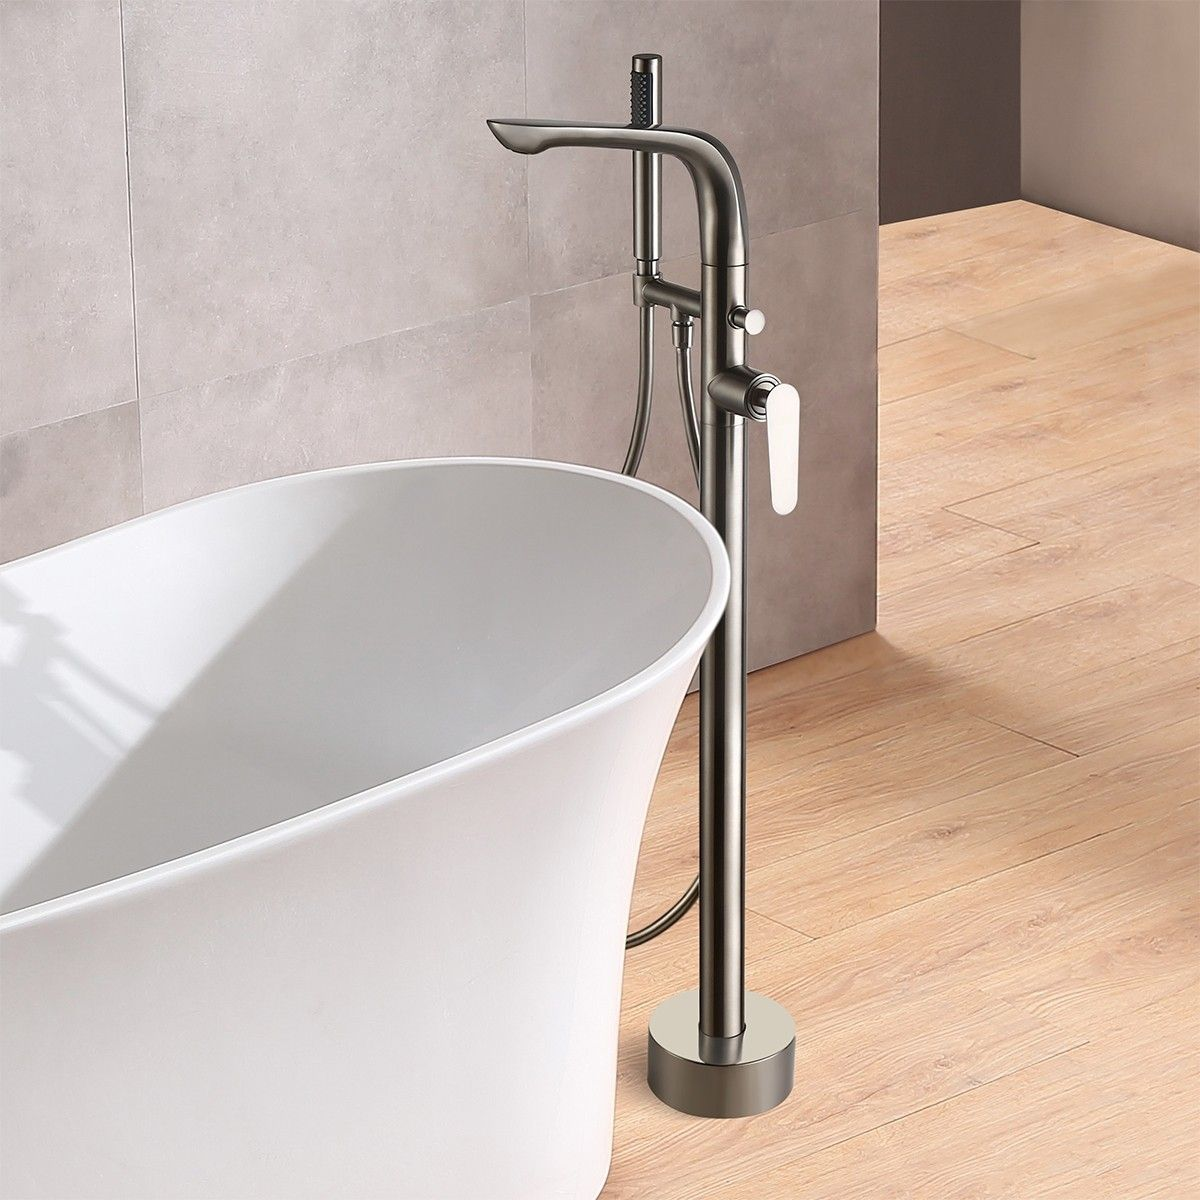 Modern Stylish Freestanding Bathtub Faucet Brushed Nickel Floor